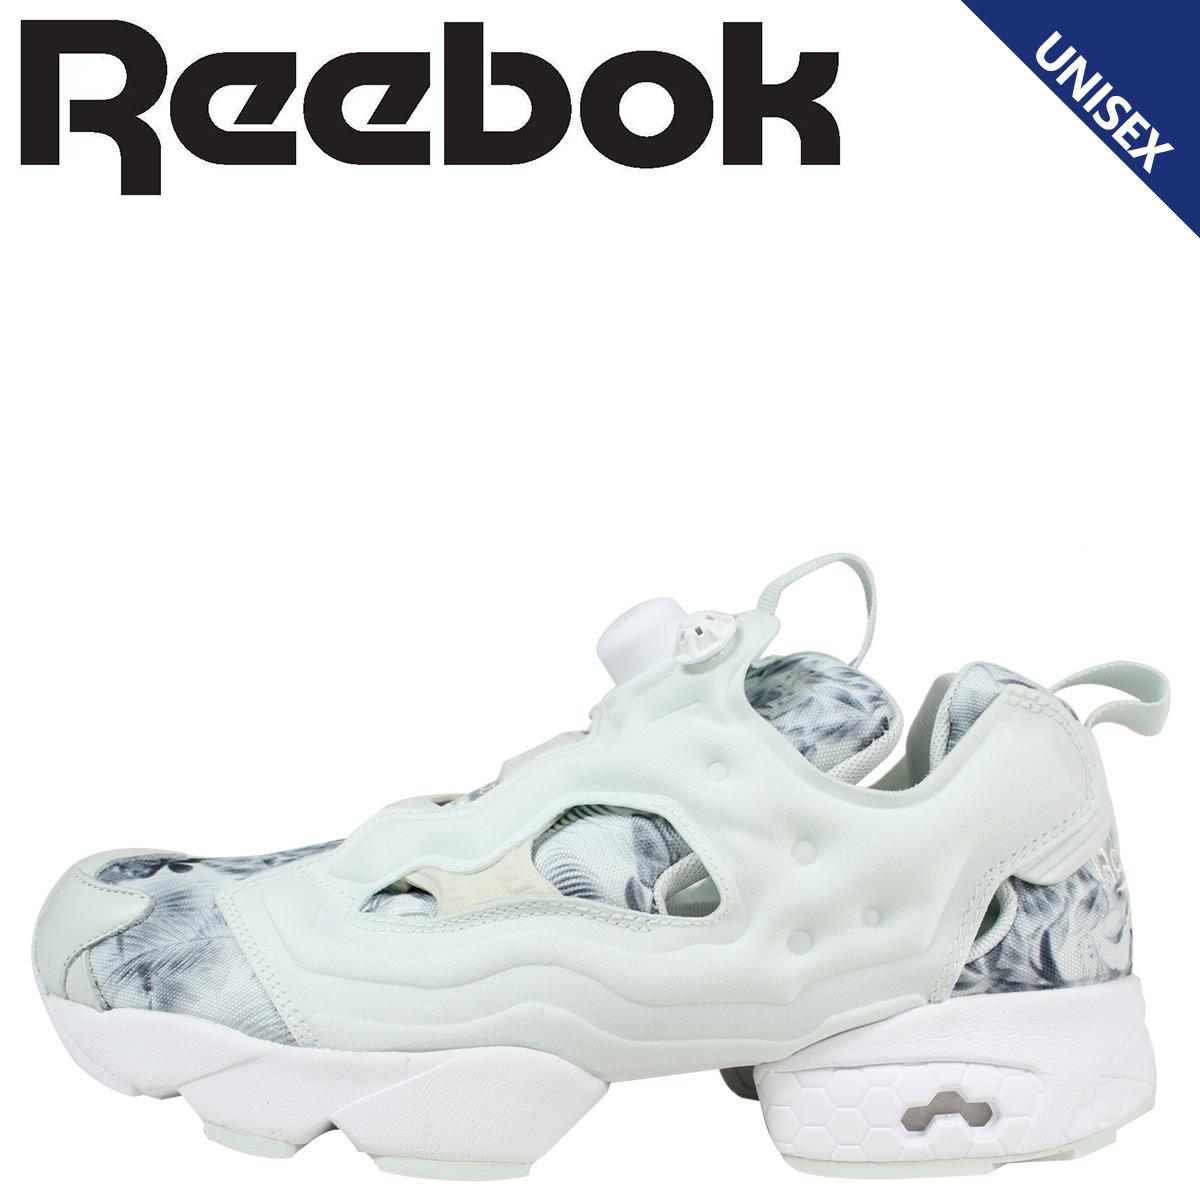 d0500079e7db reebok pump womens cheap   OFF45% The Largest Catalog Discounts